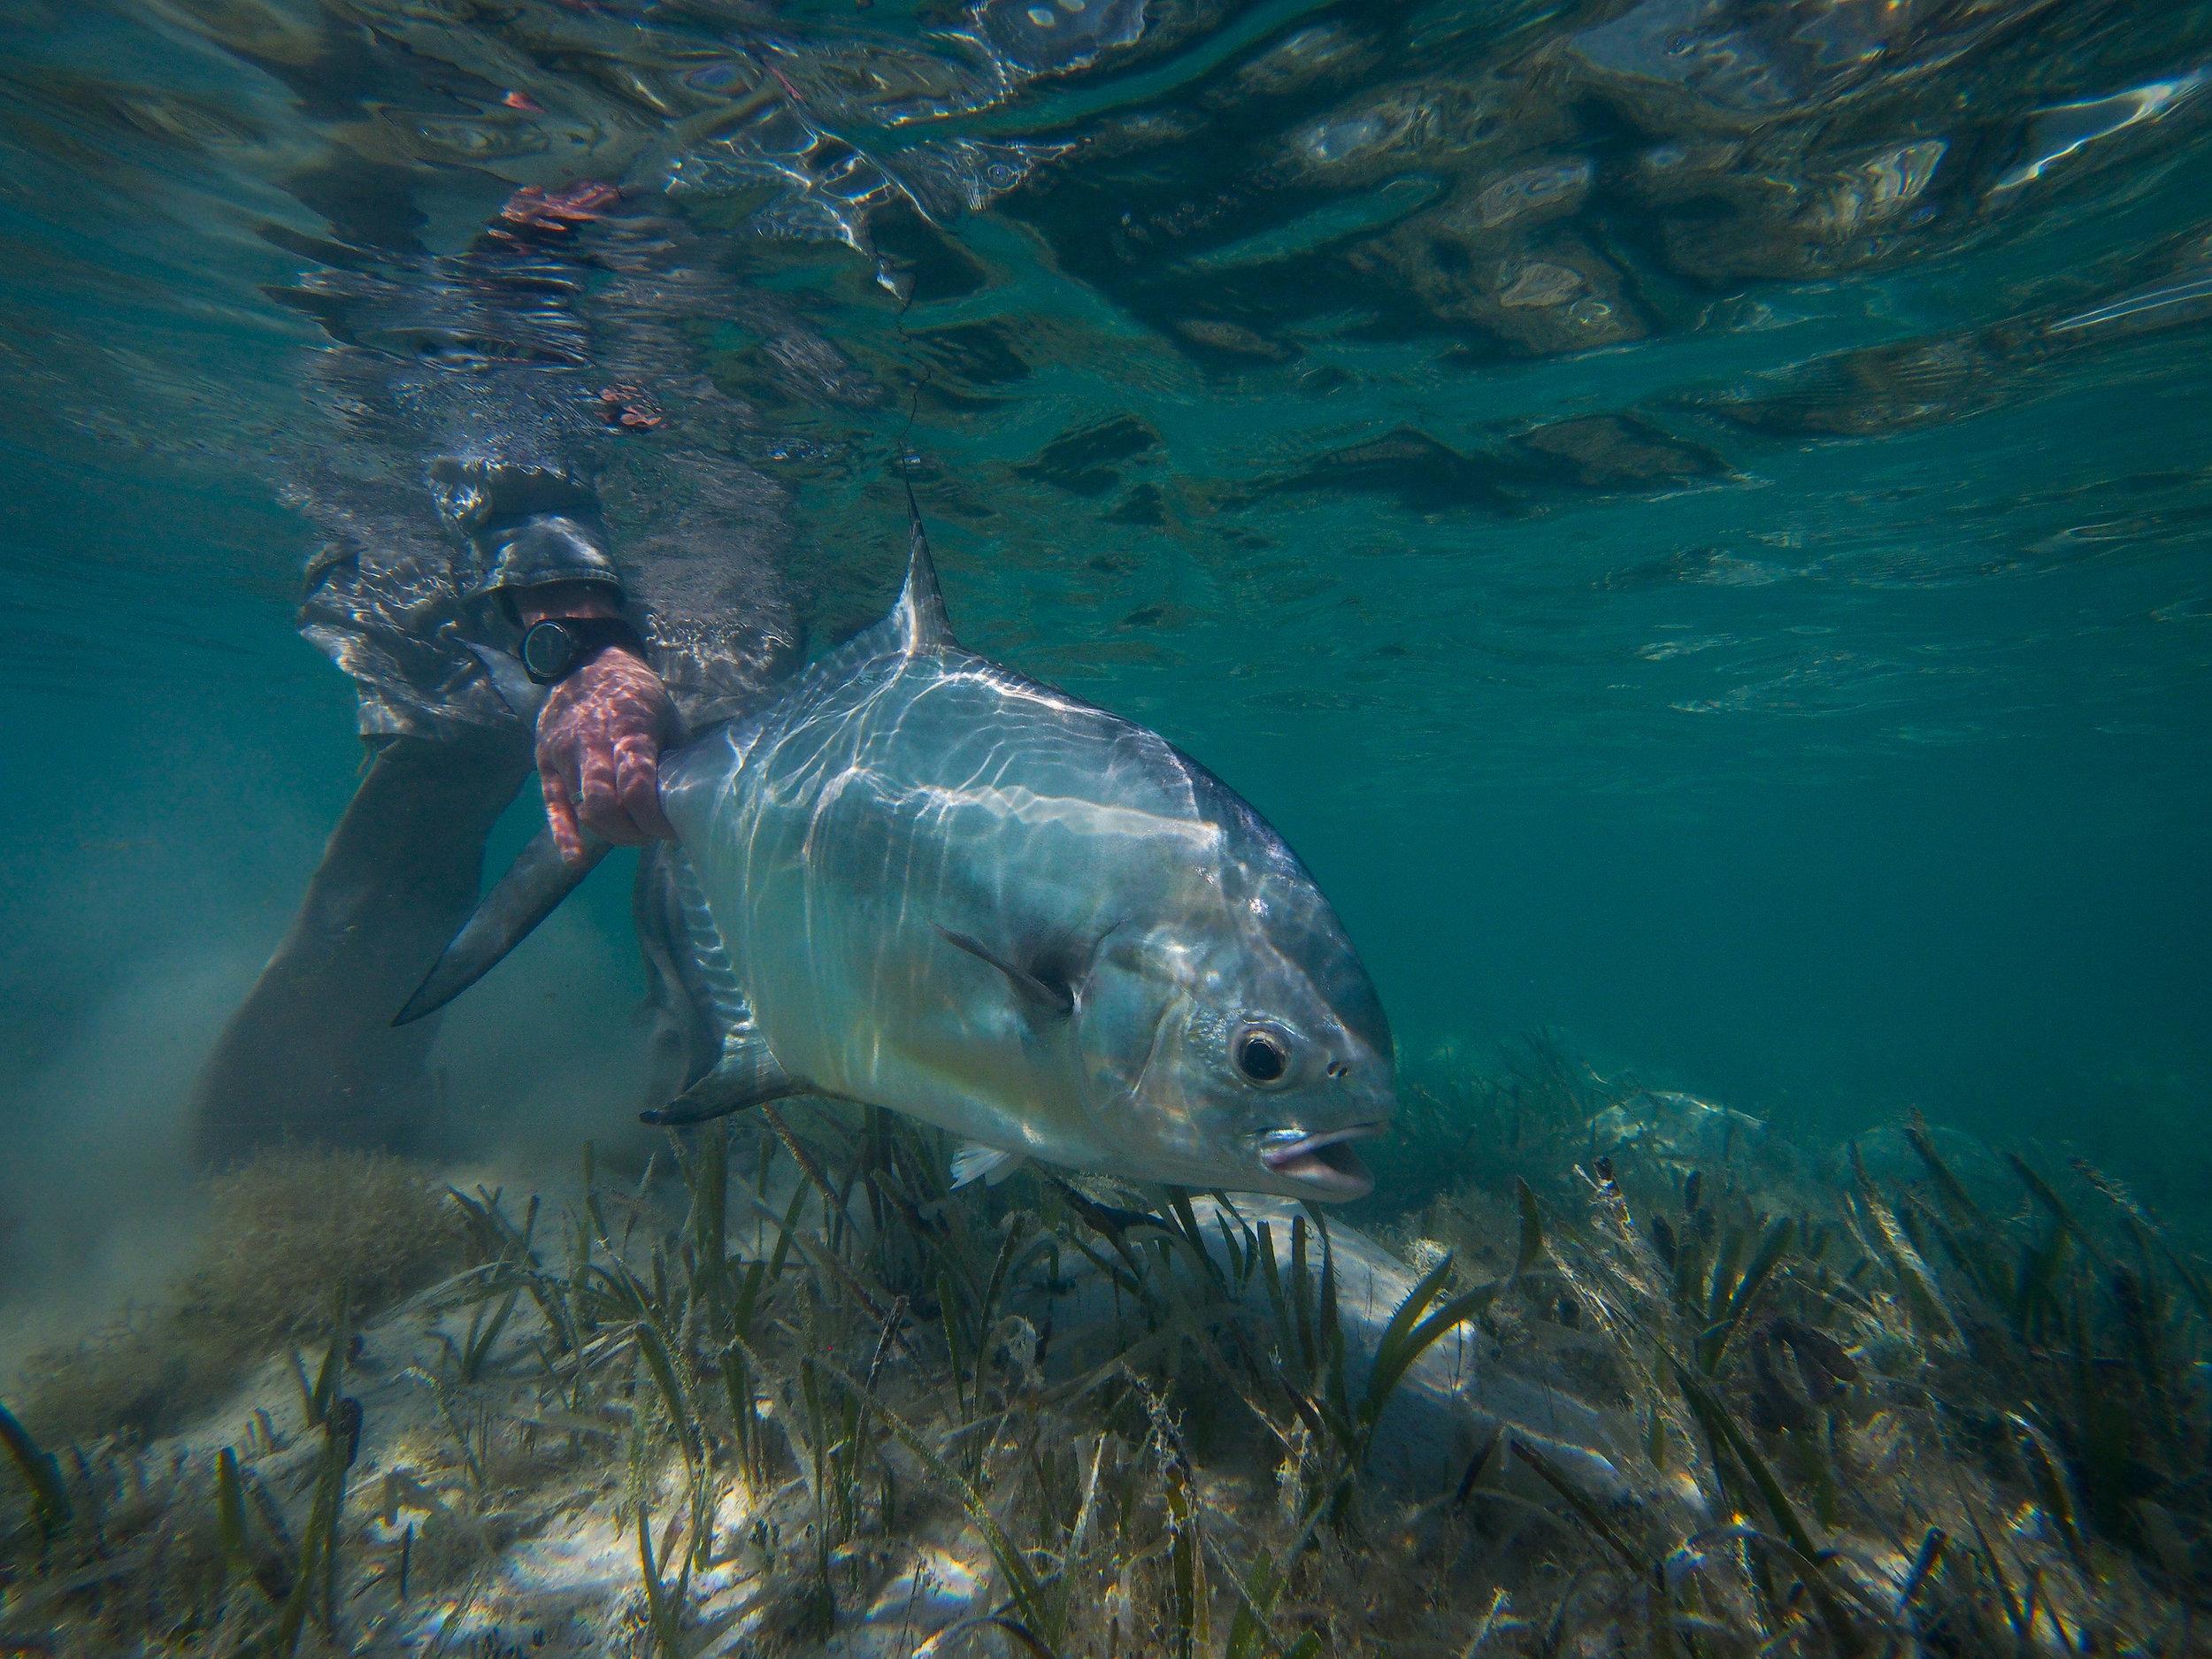 Underwater Permit image, Cayo Largo, Cuba